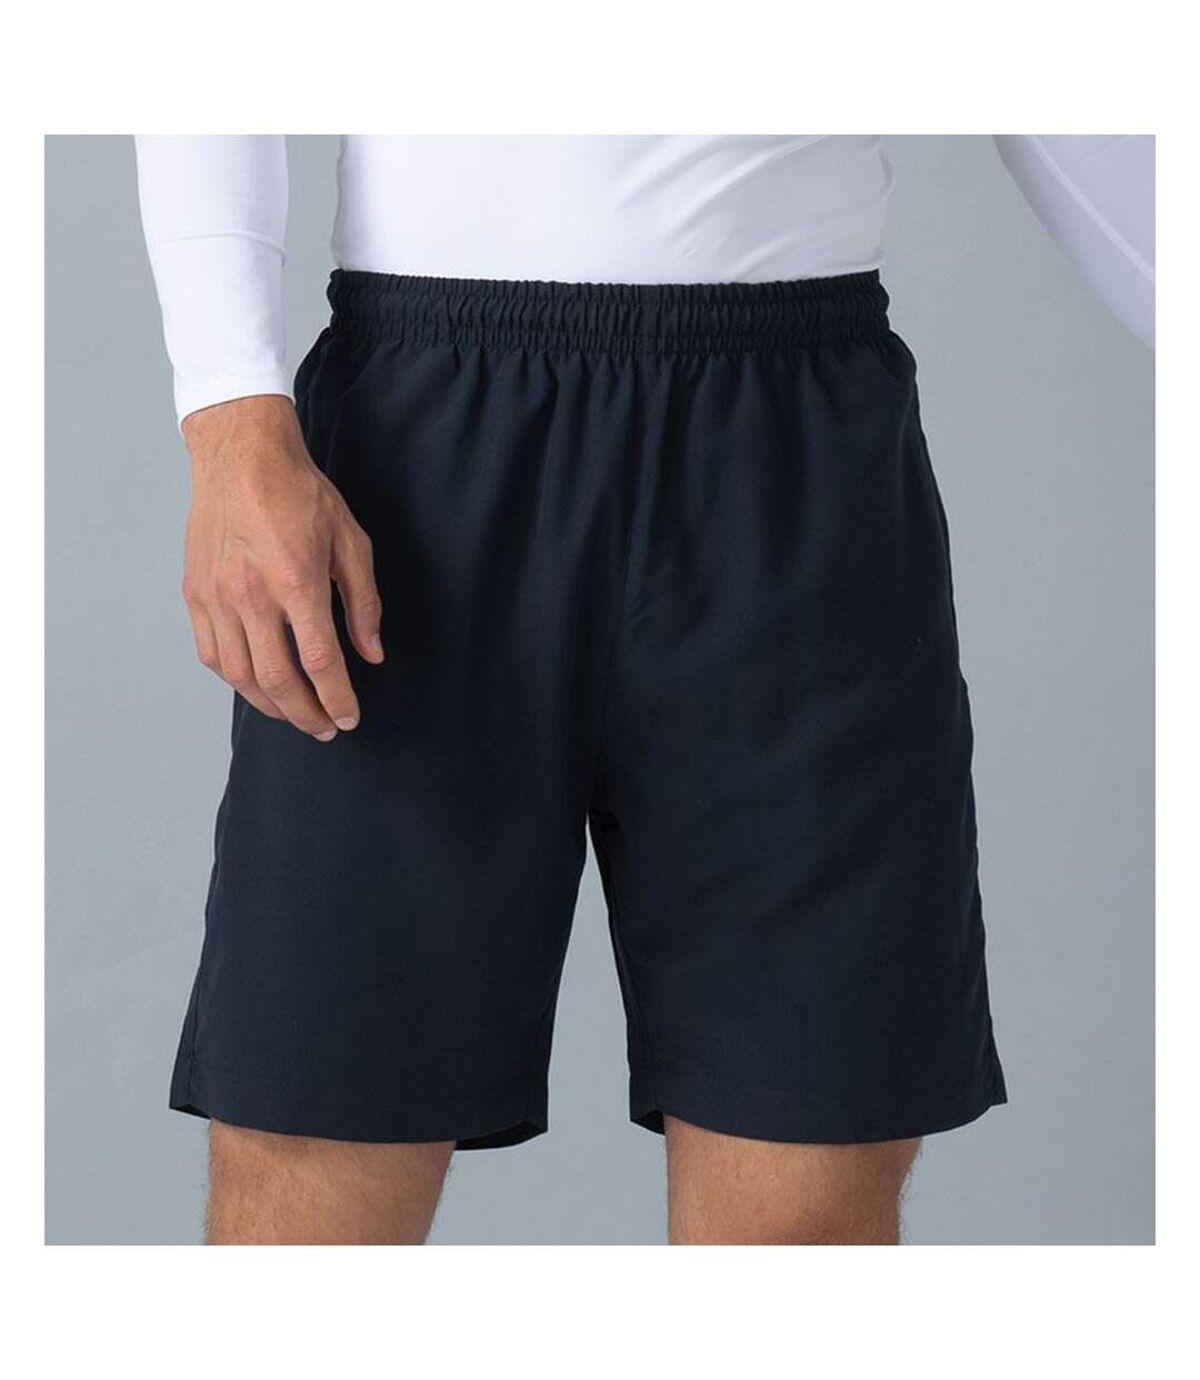 Finden & Hales Mens Microfibre Sports Short (Navy) - UTRW449